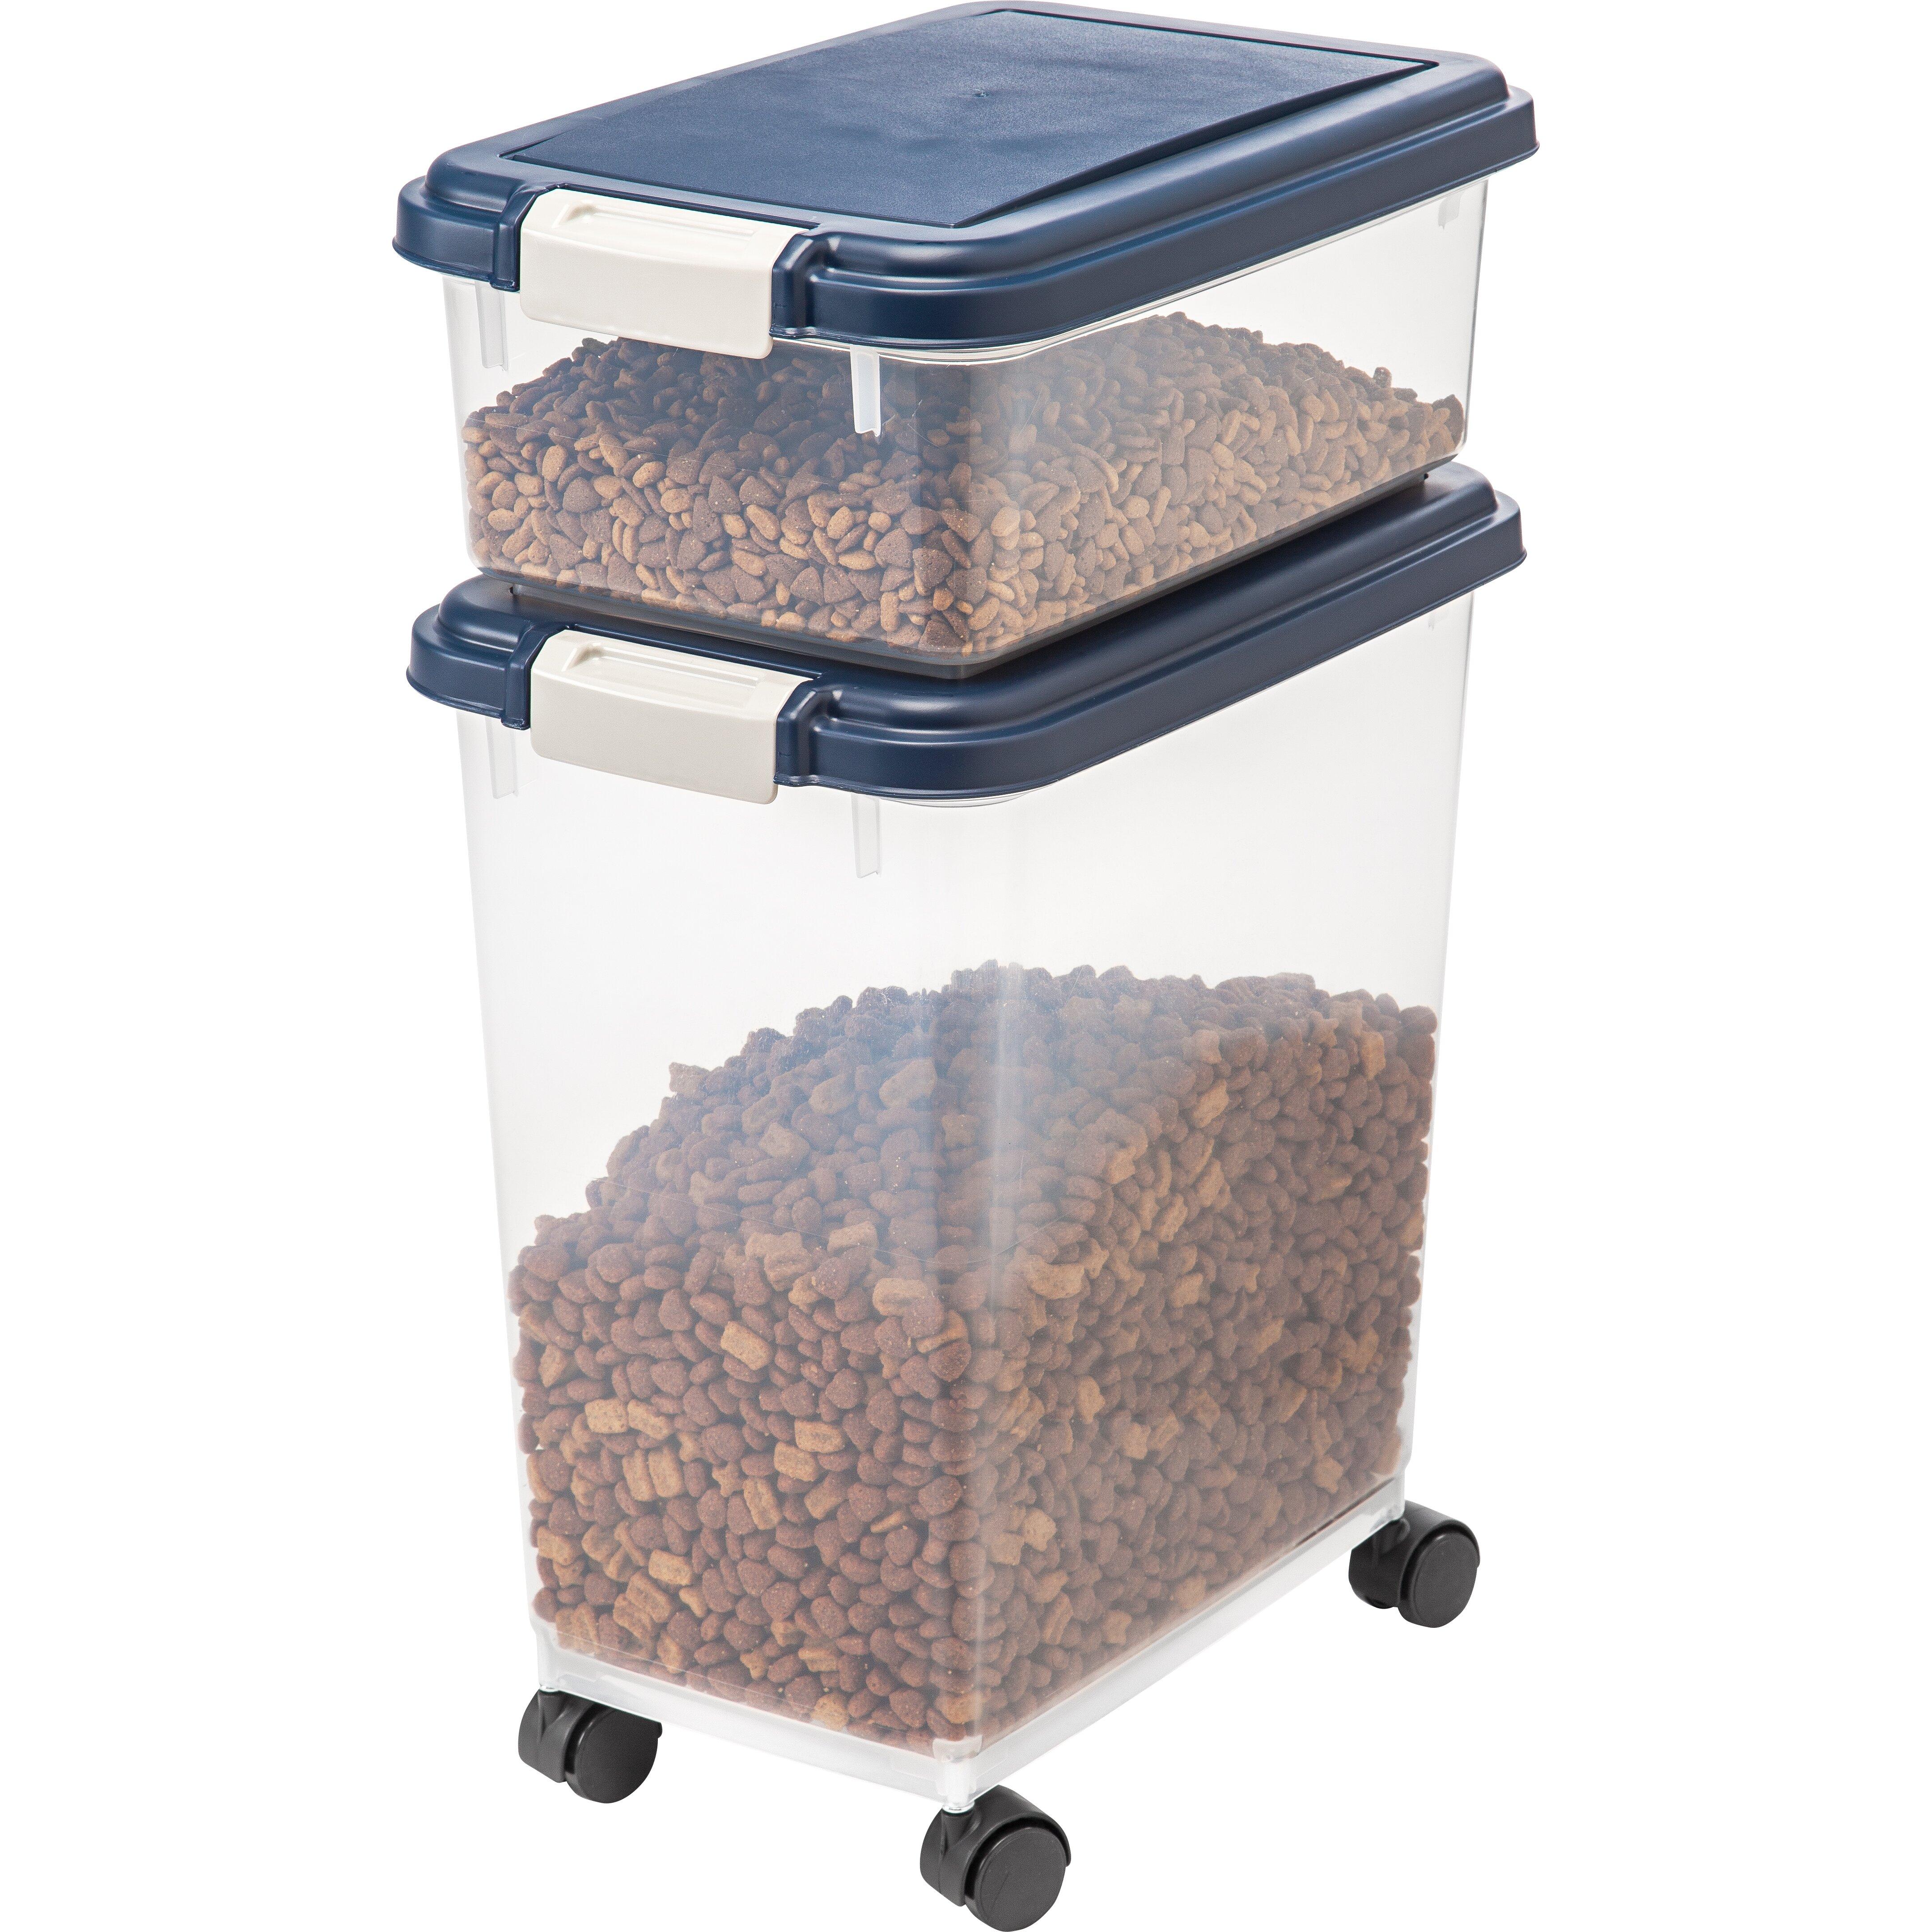 iris 3 piece airtight pet food storage container set reviews wayfair. Black Bedroom Furniture Sets. Home Design Ideas